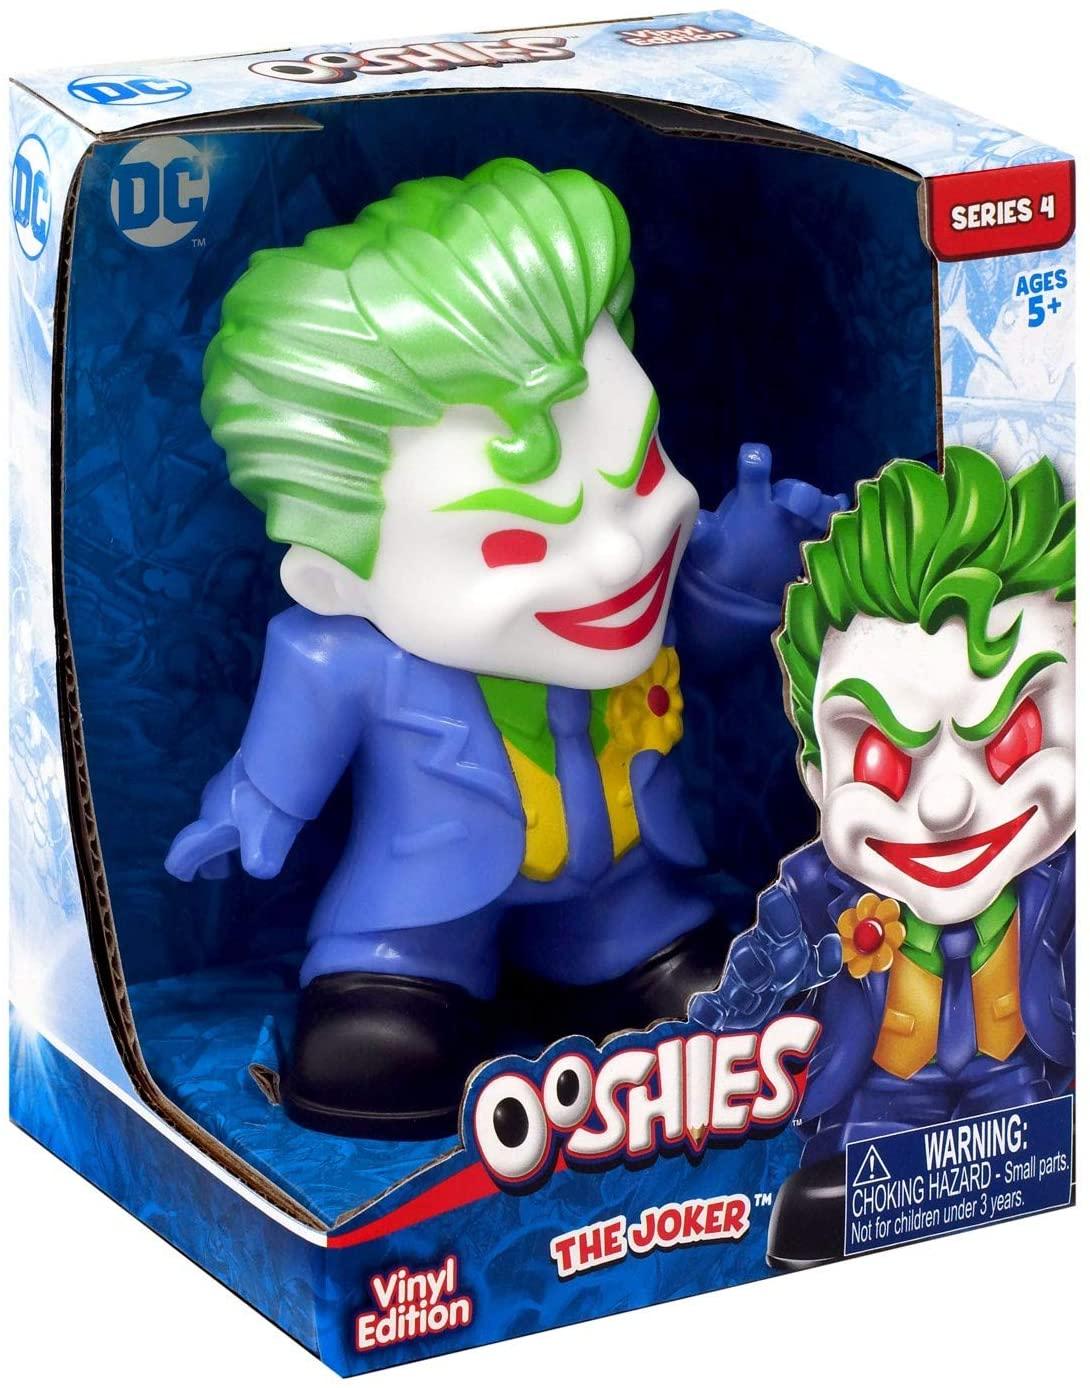 Ooshies Series 4 DC Comics 4